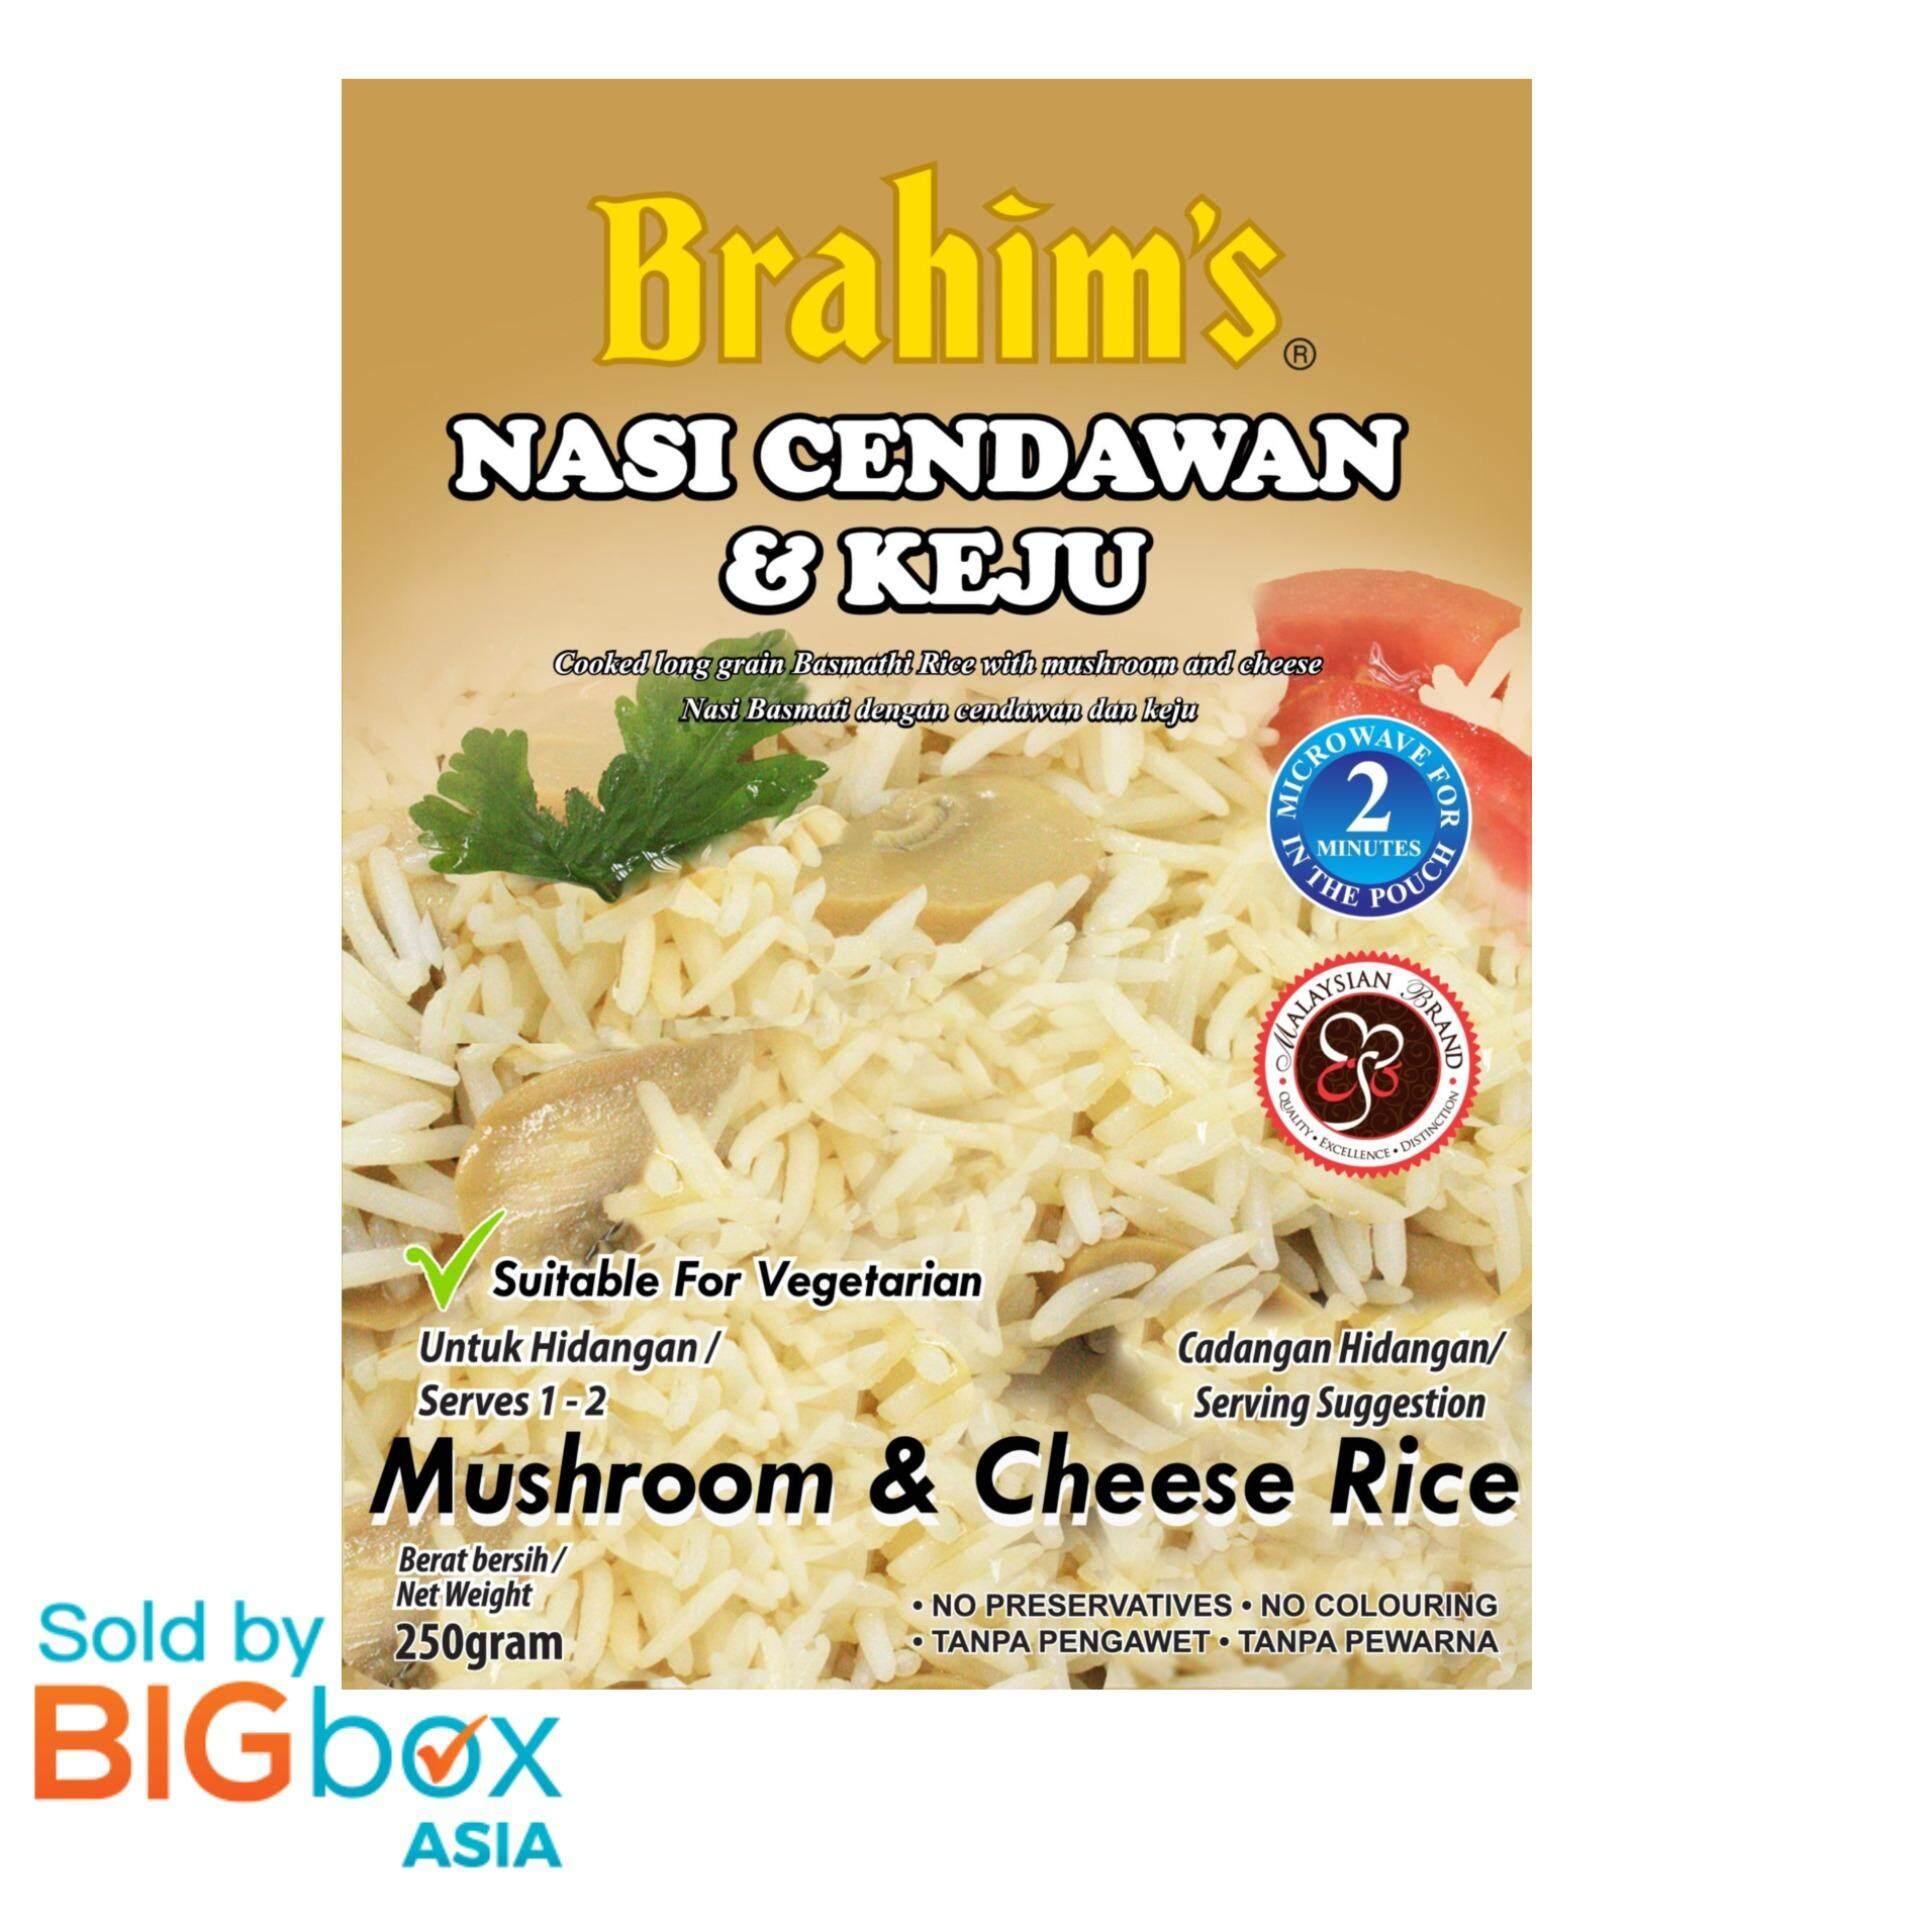 [BIGBox Asia] Brahims Ready To Eat Cheese & Mushroom Rice 250g - Malaysia